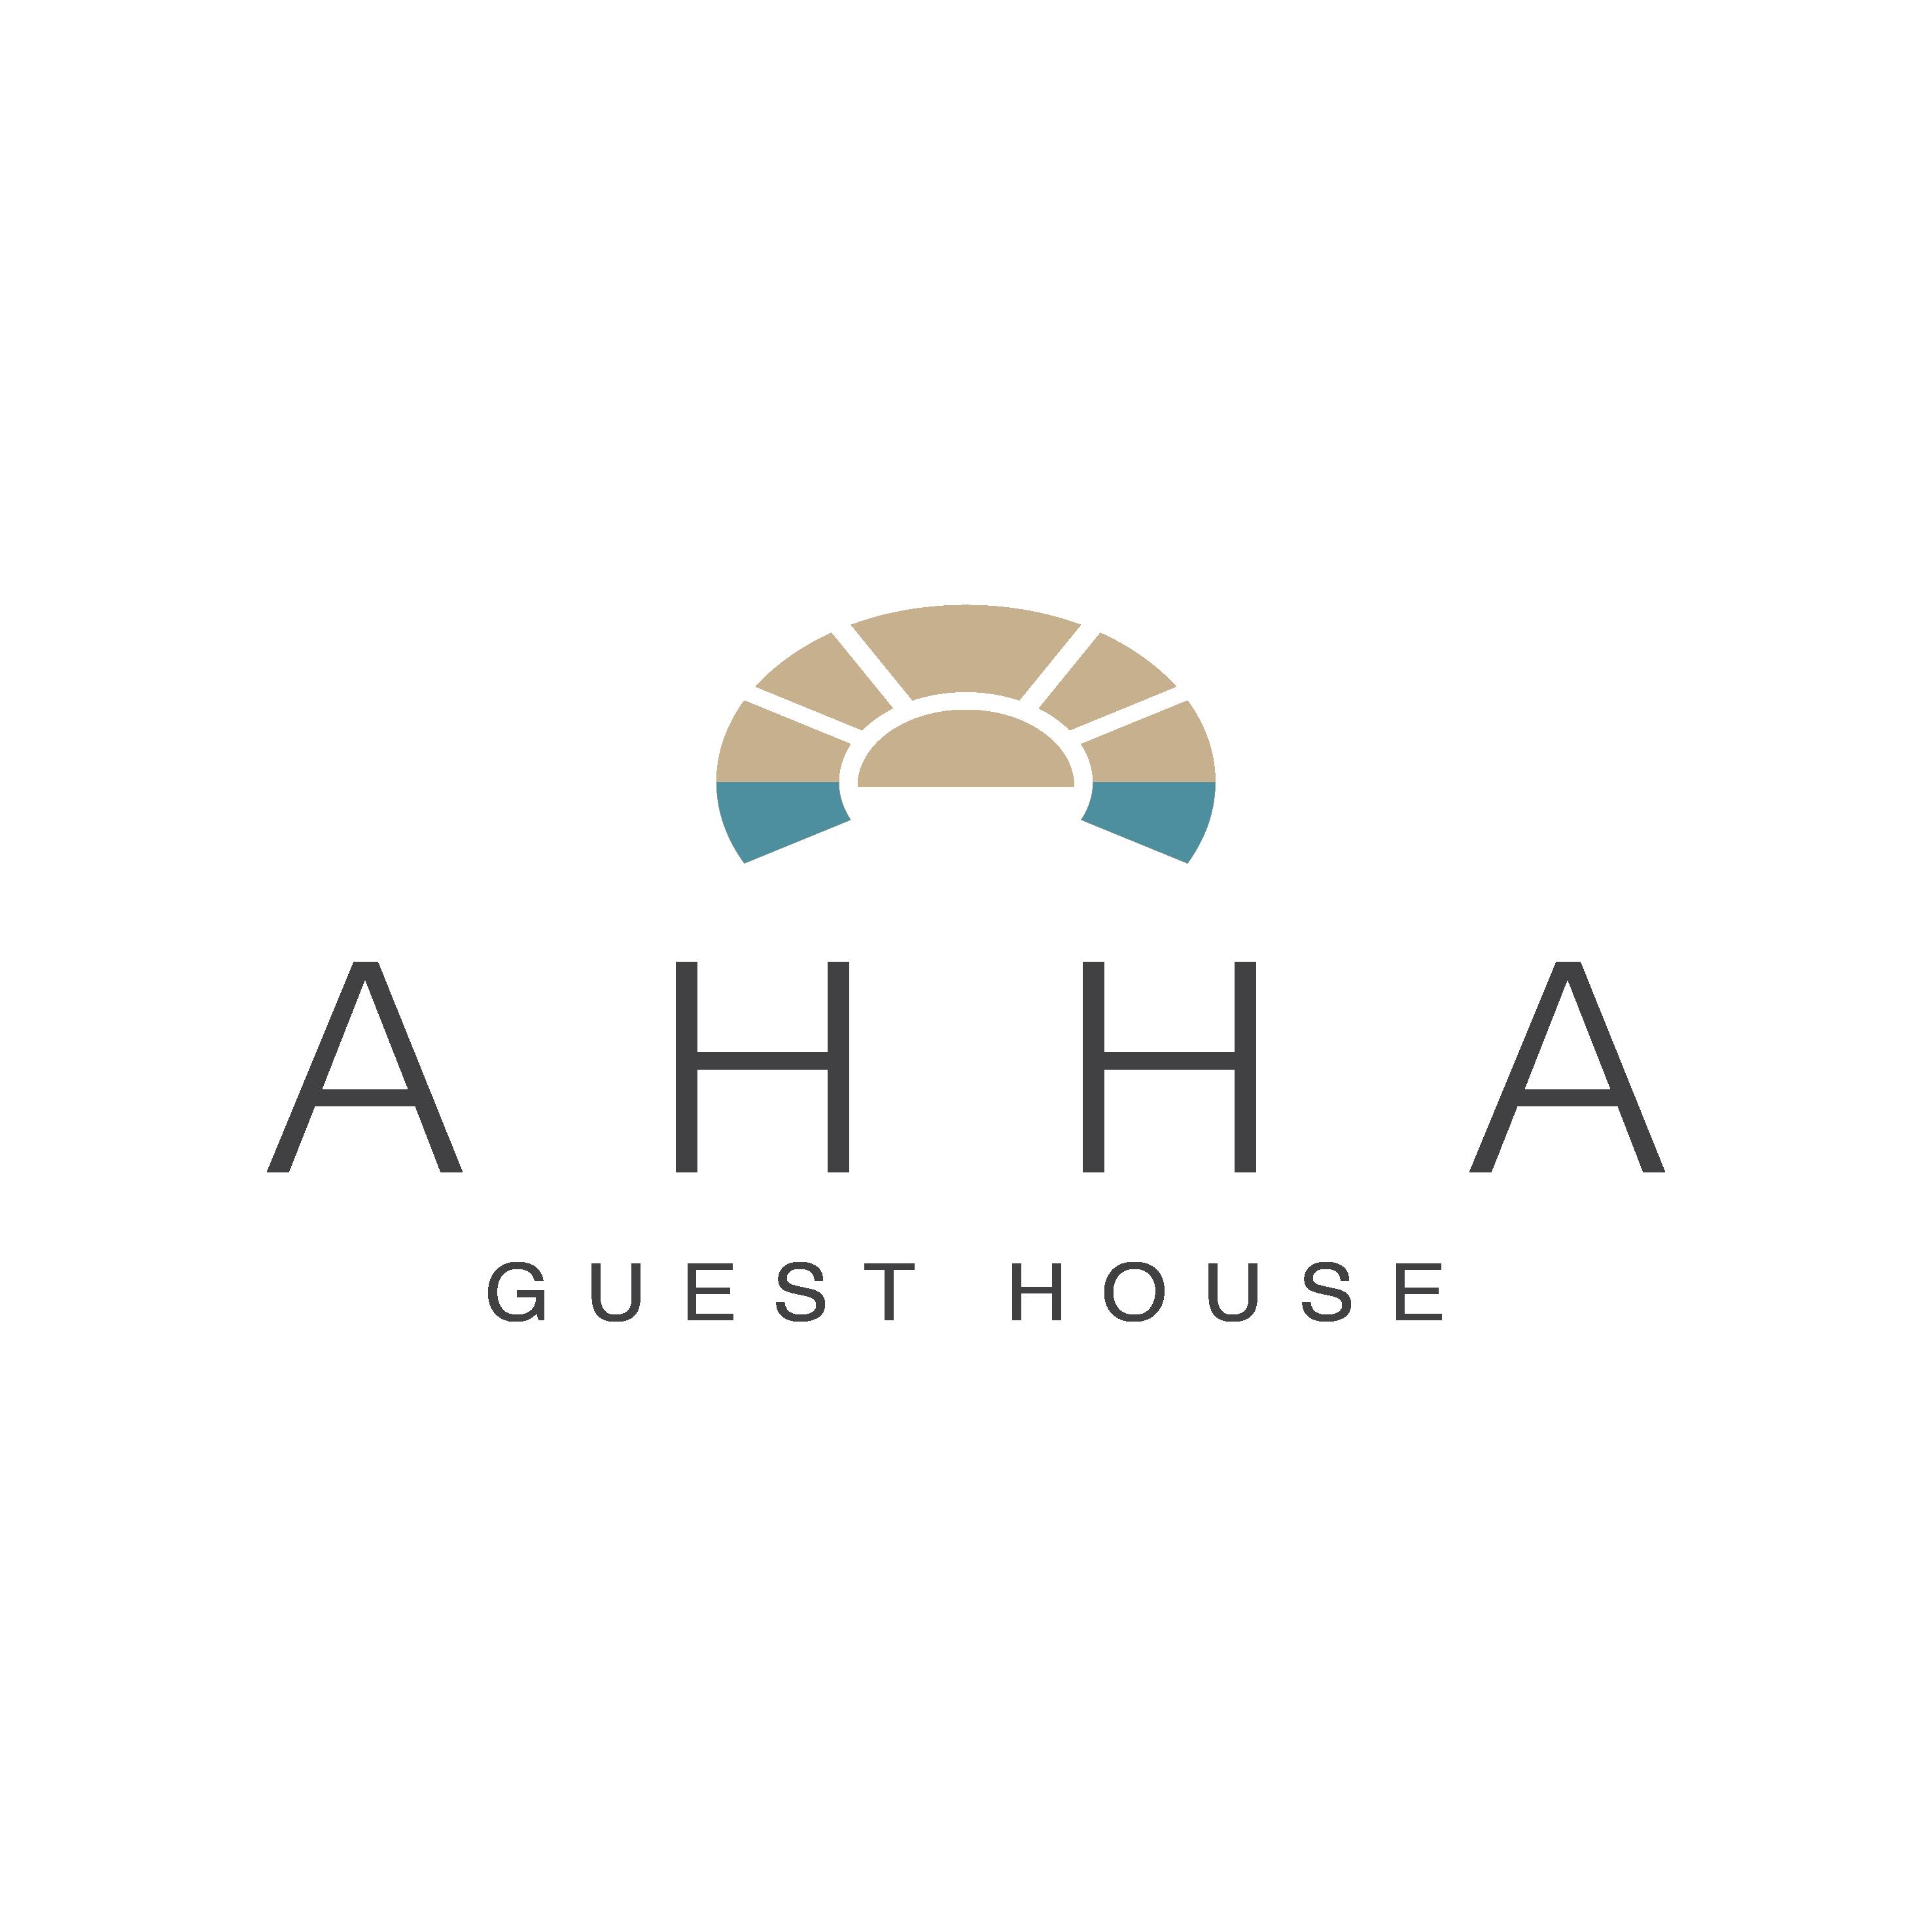 AHHA GUEST HOUSE